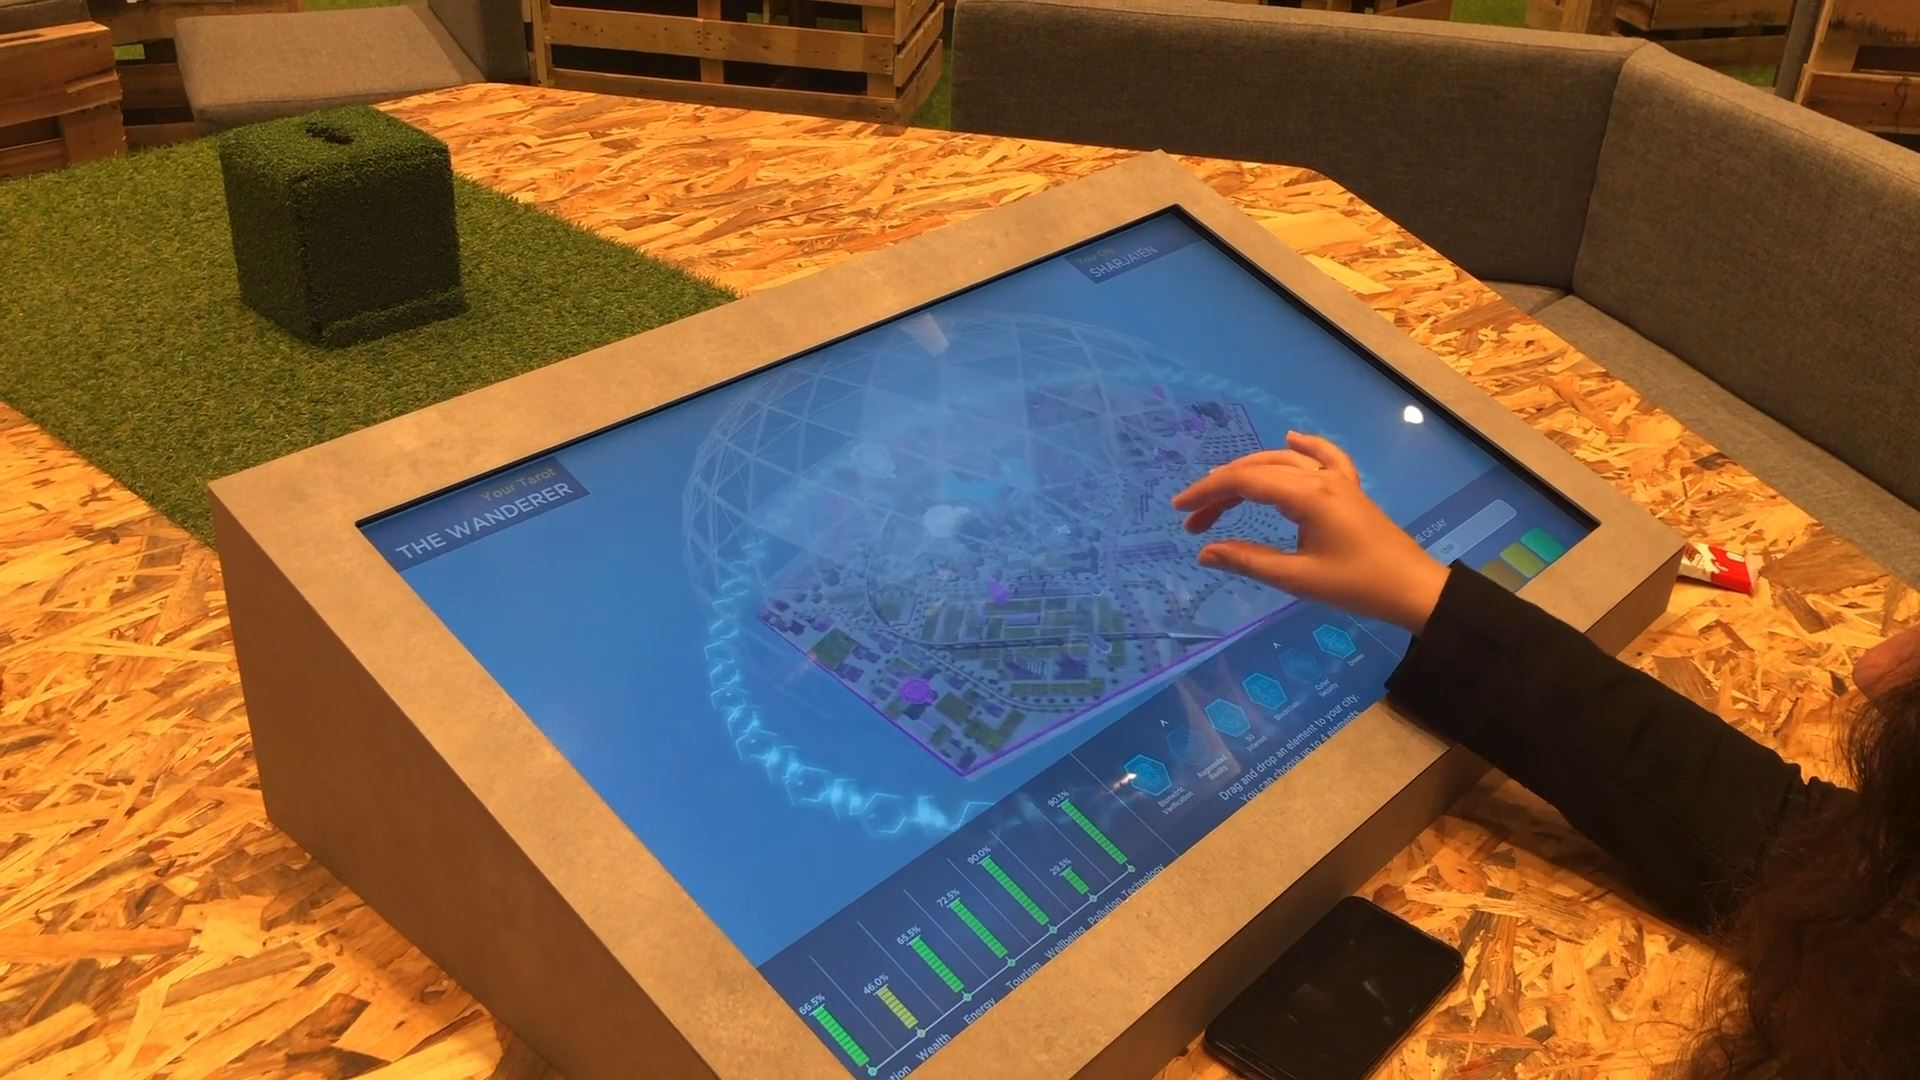 sharjah e-Government retreat interactive technology integration touchscreen training